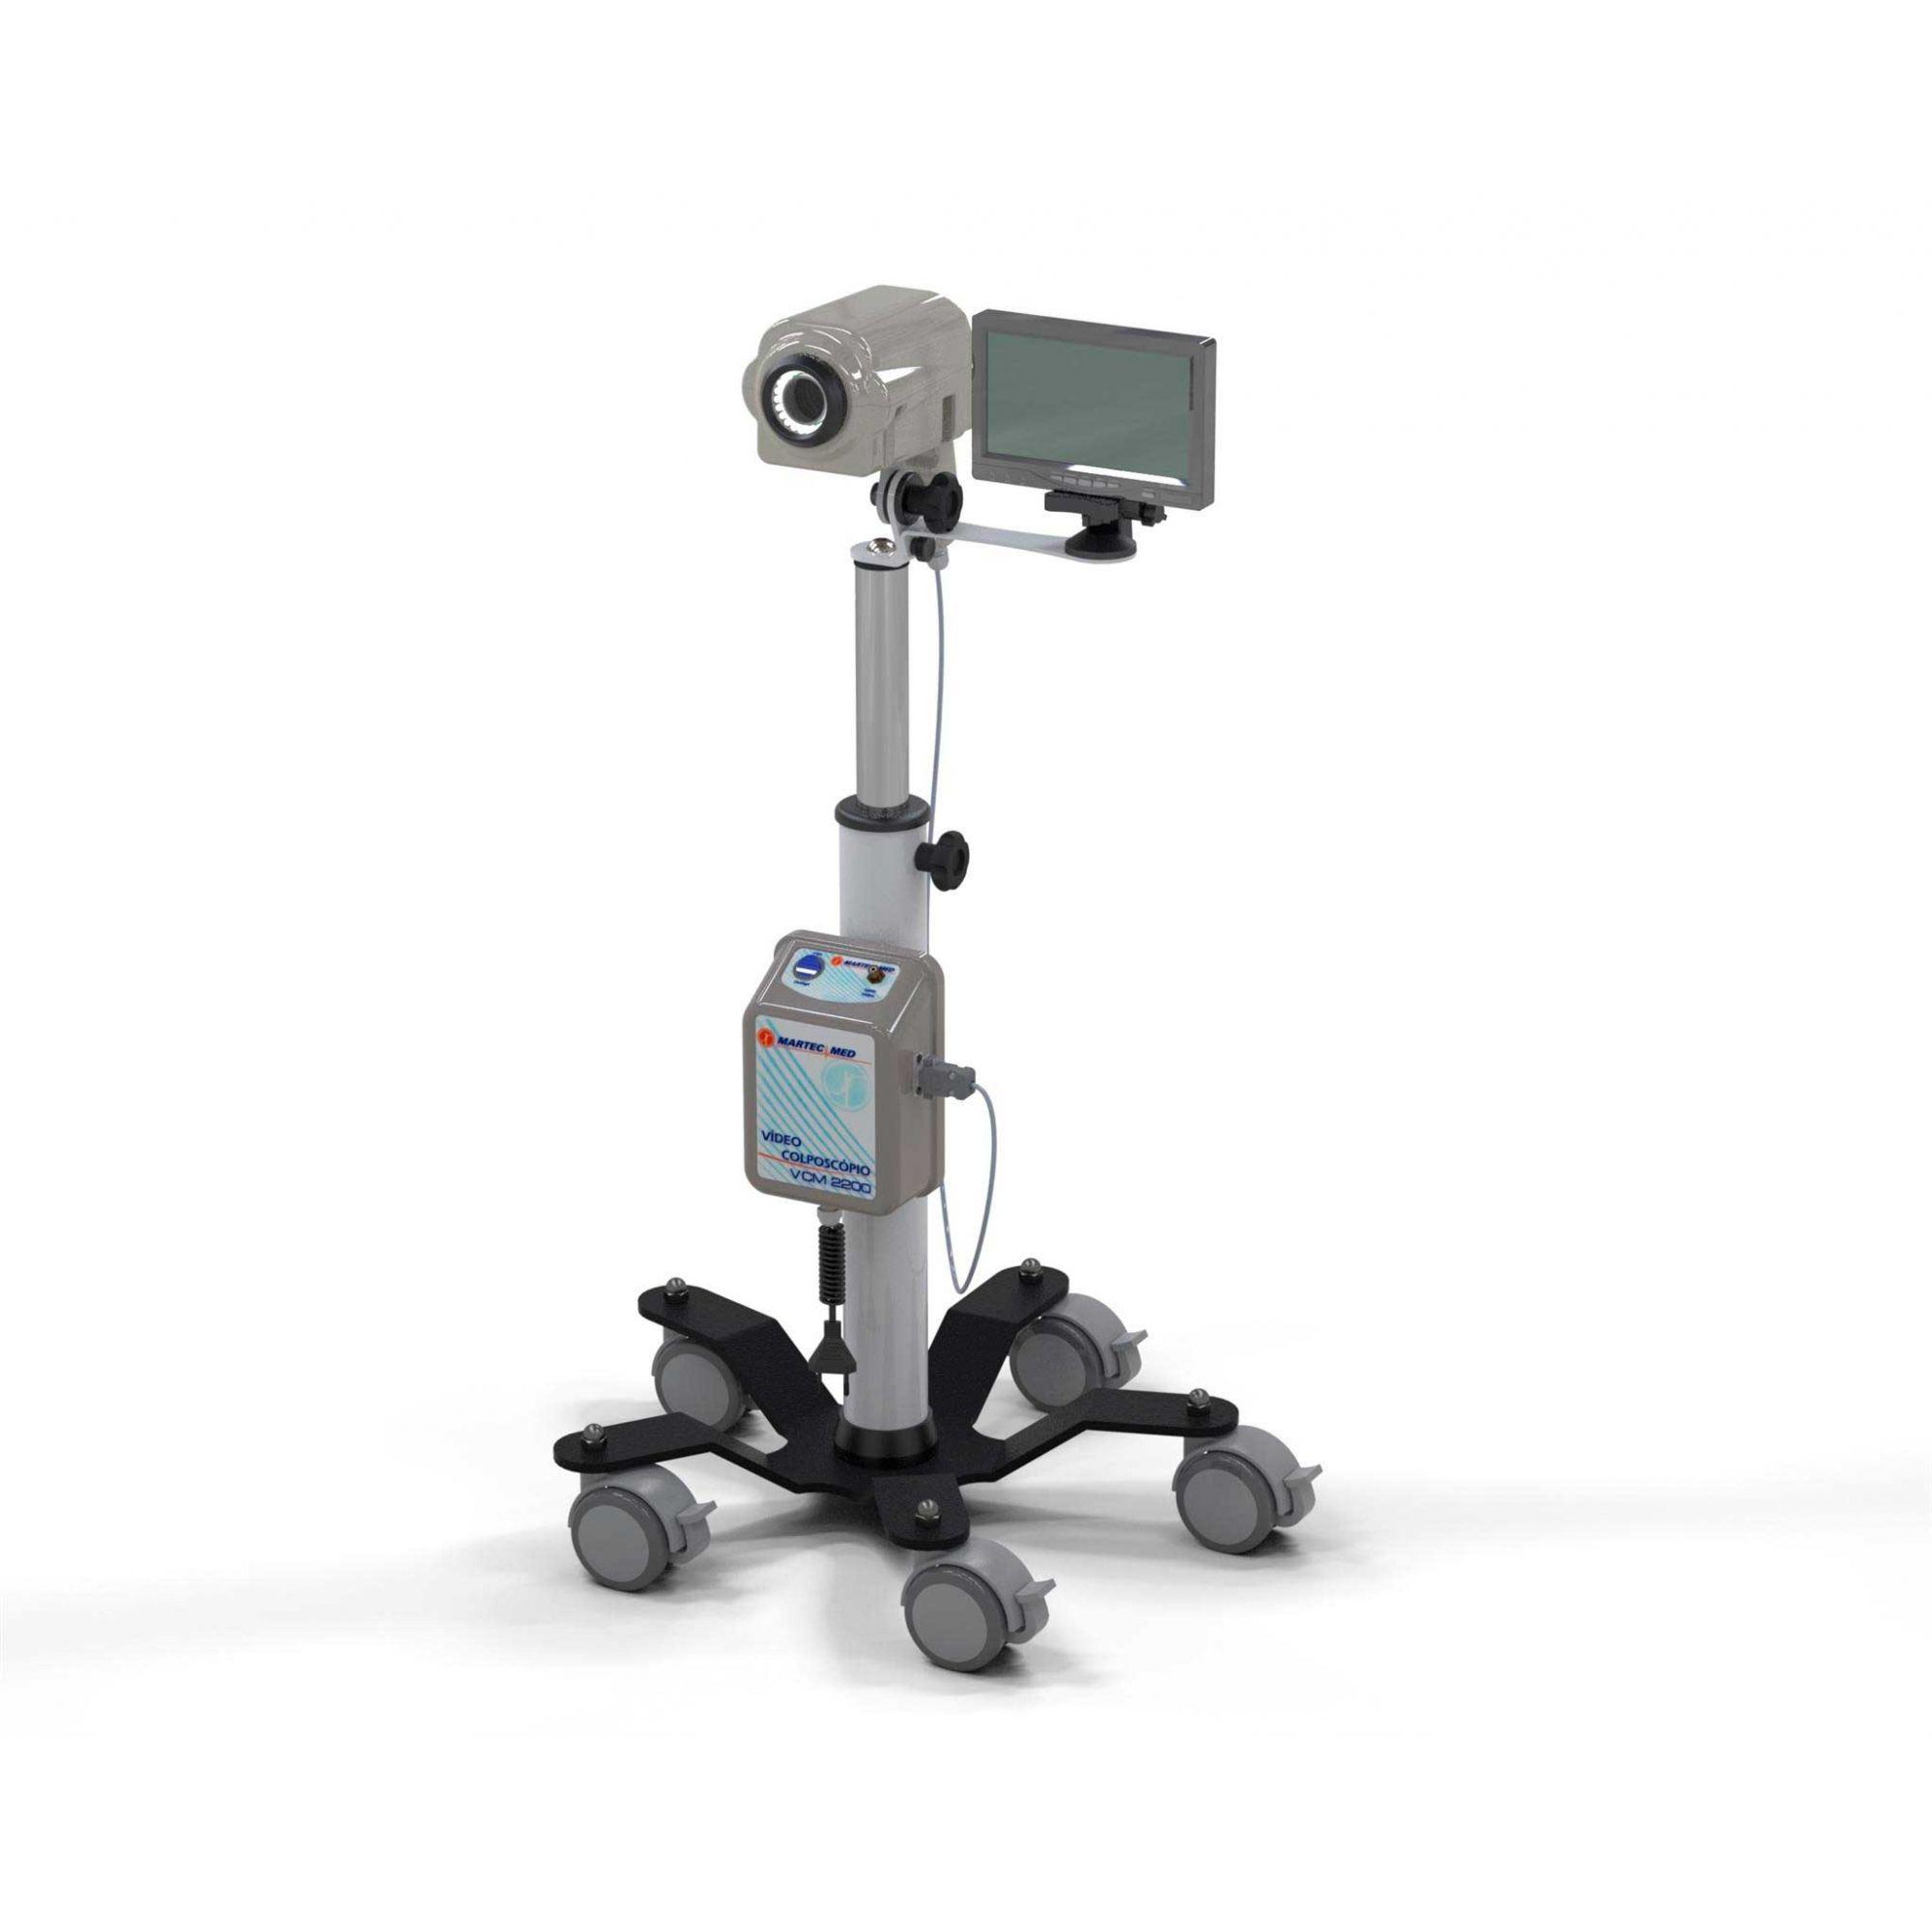 Videocolposcópio (acompanha monitor 7') – Modelo  VCM2200 – Martec